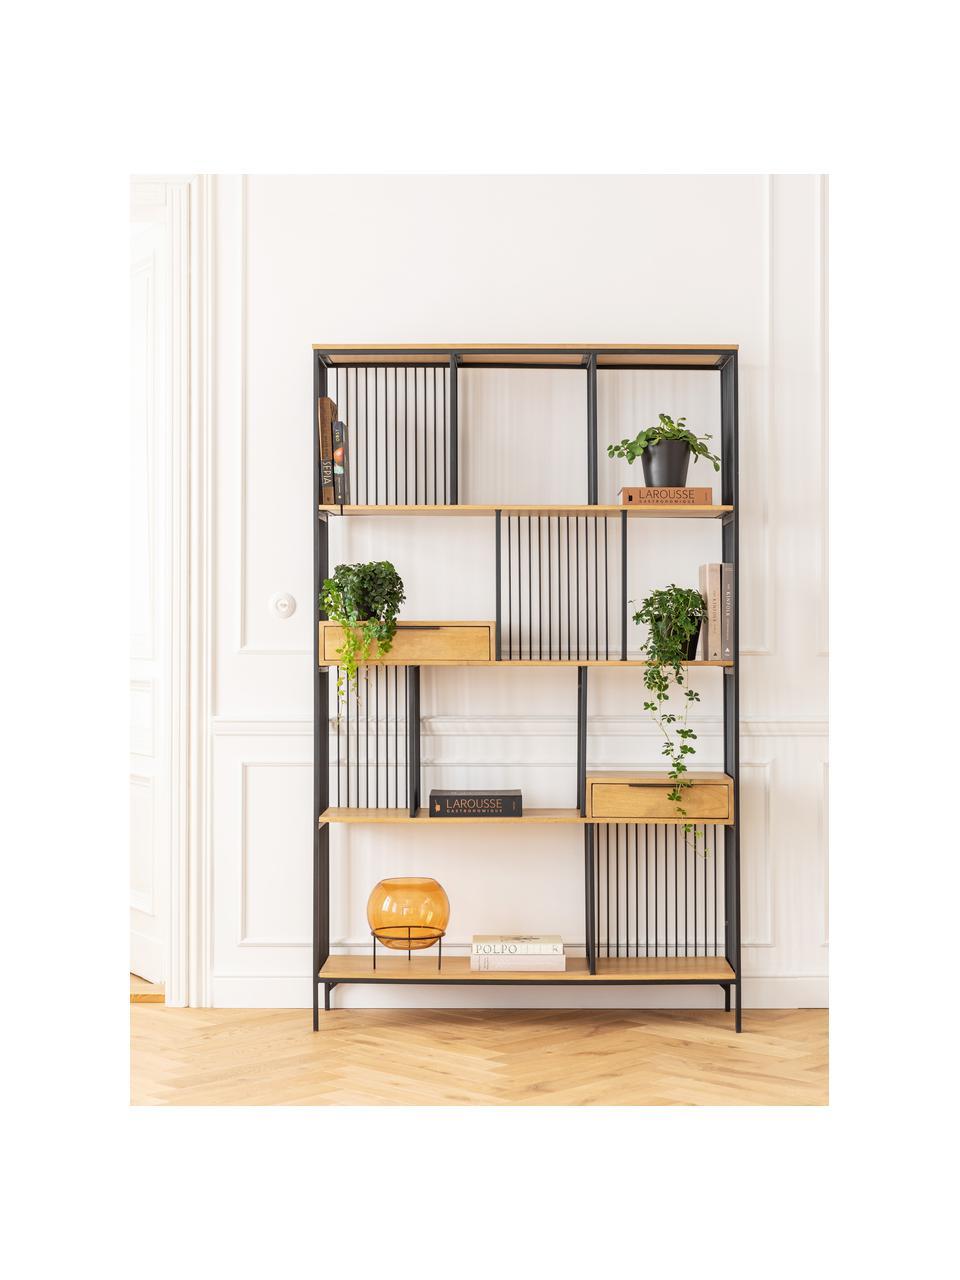 Wandrek Modena in hout en metaal, Frame: gepoedercoat metaal, Handvatten: gepoedercoat metaal, Zwart, 125 x 200 cm